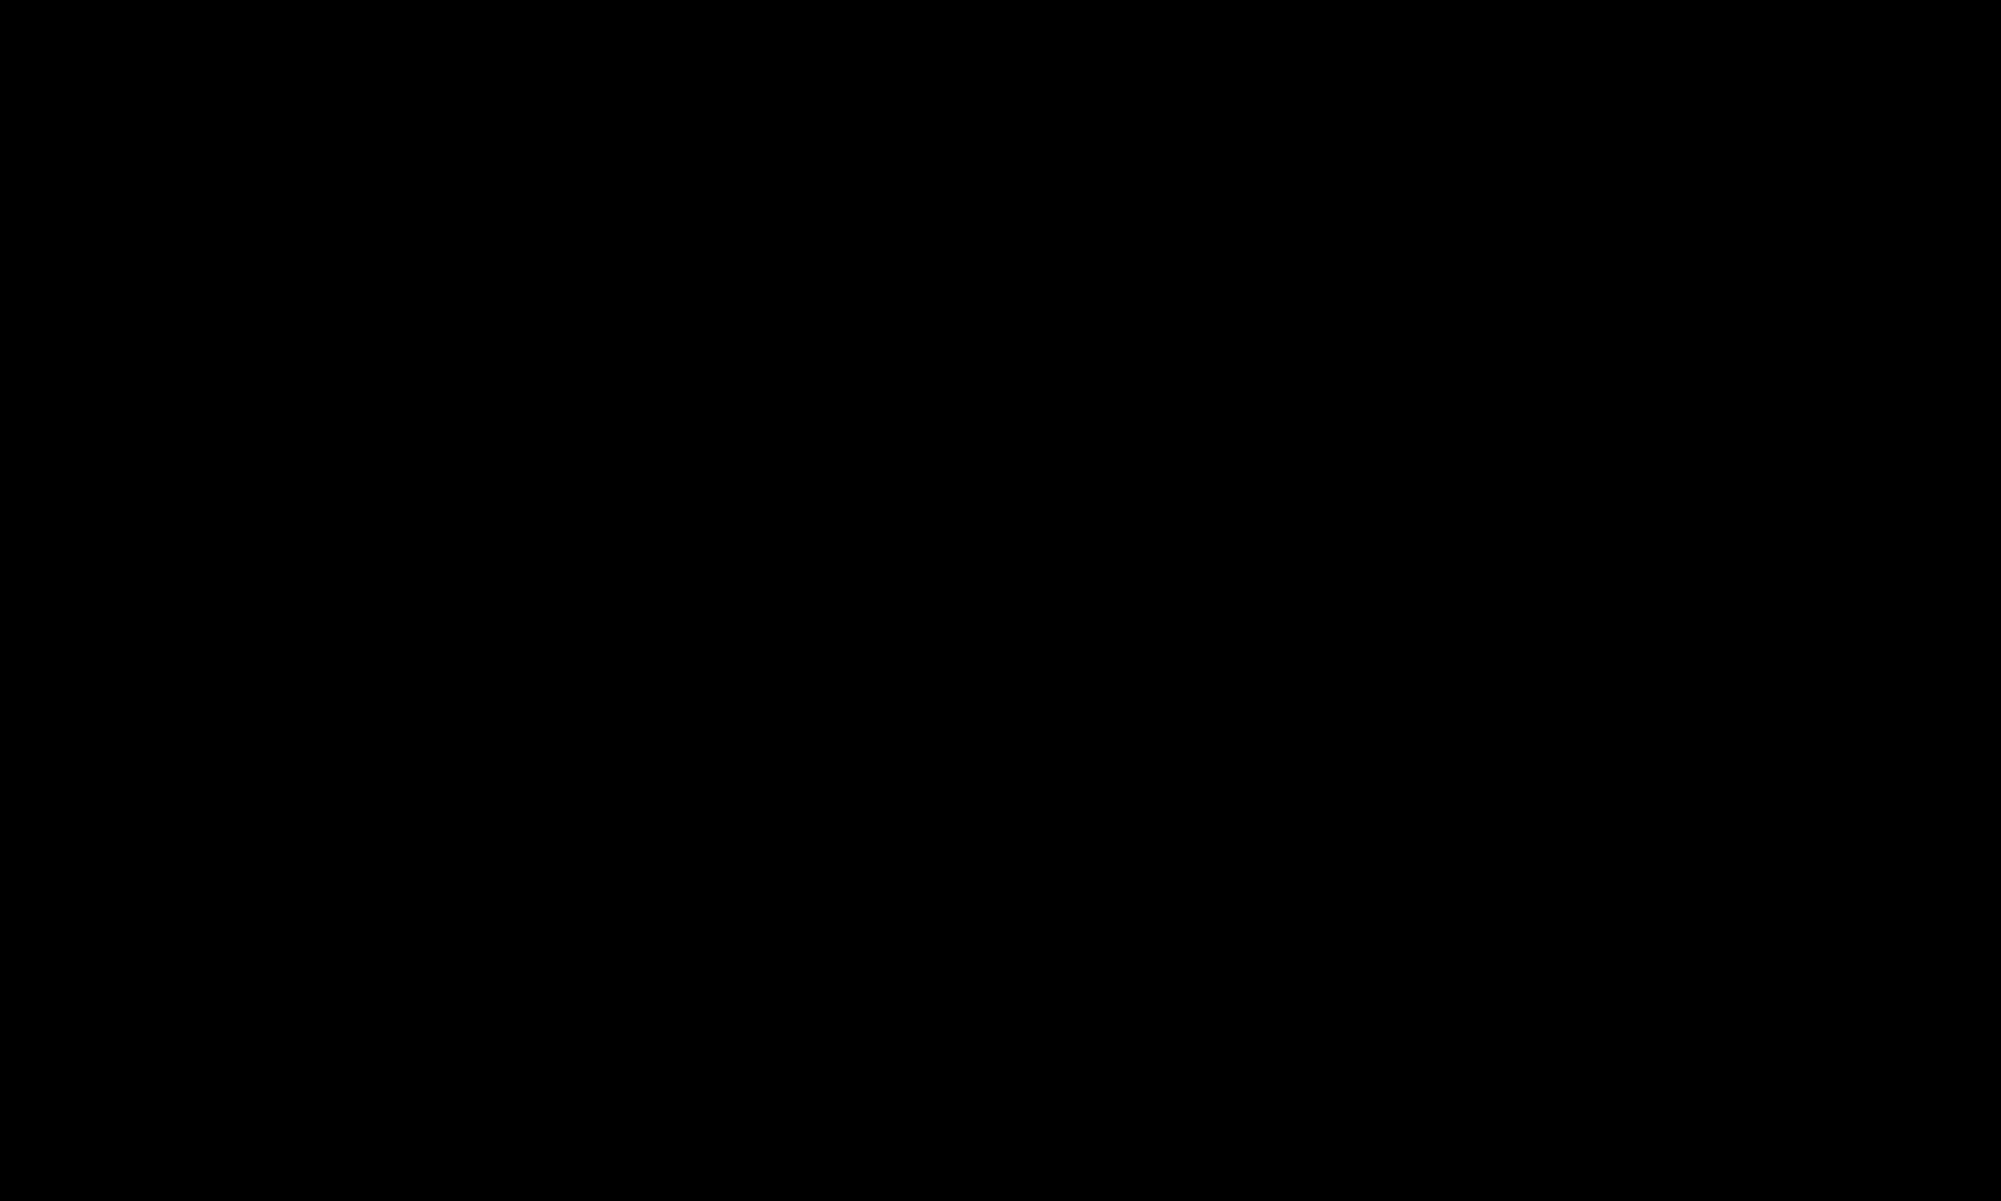 PngItem_5231596 (4)